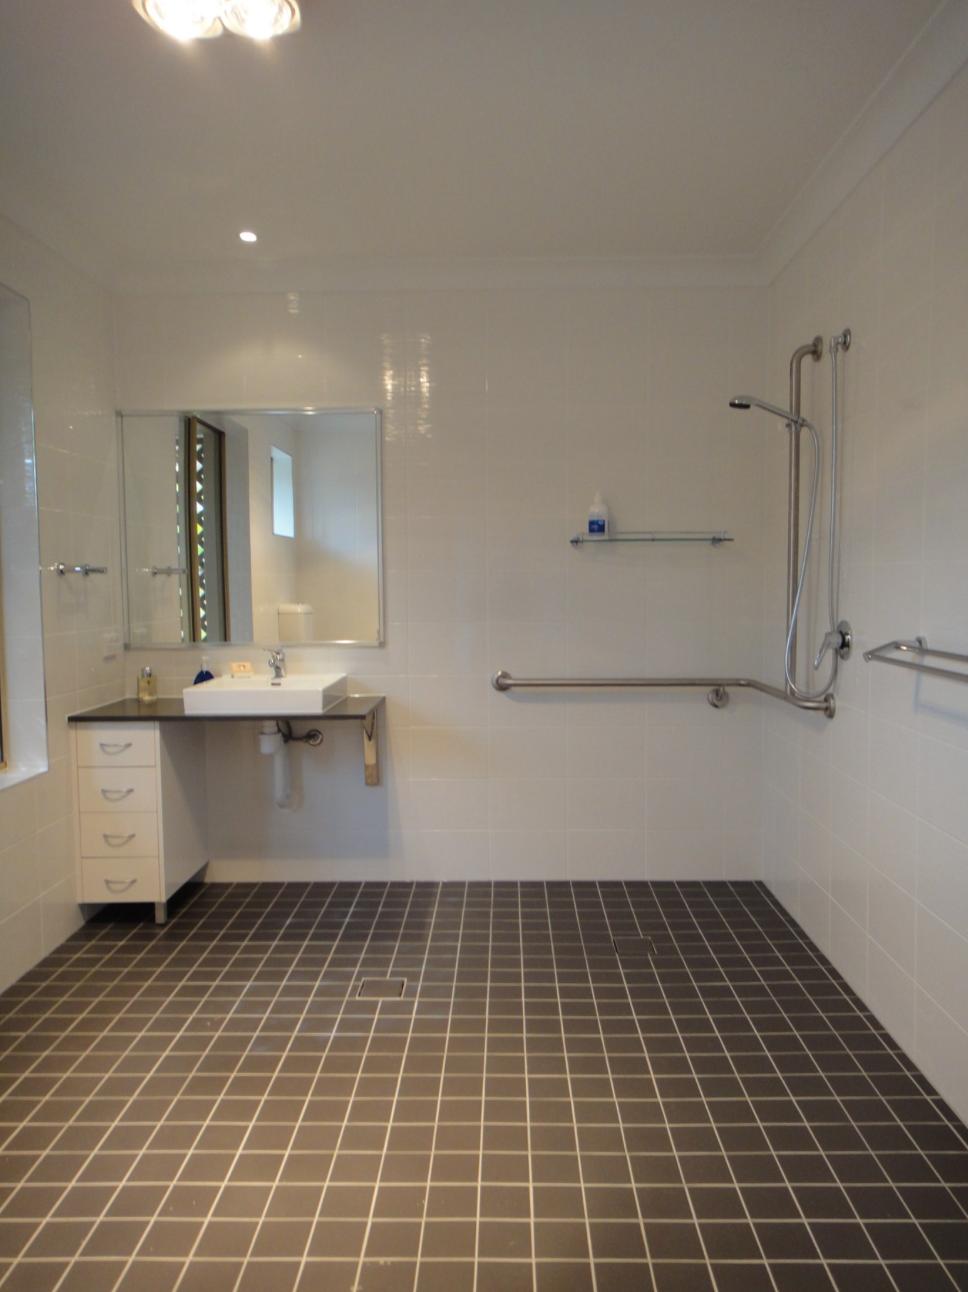 Accessible Bathroom Modification